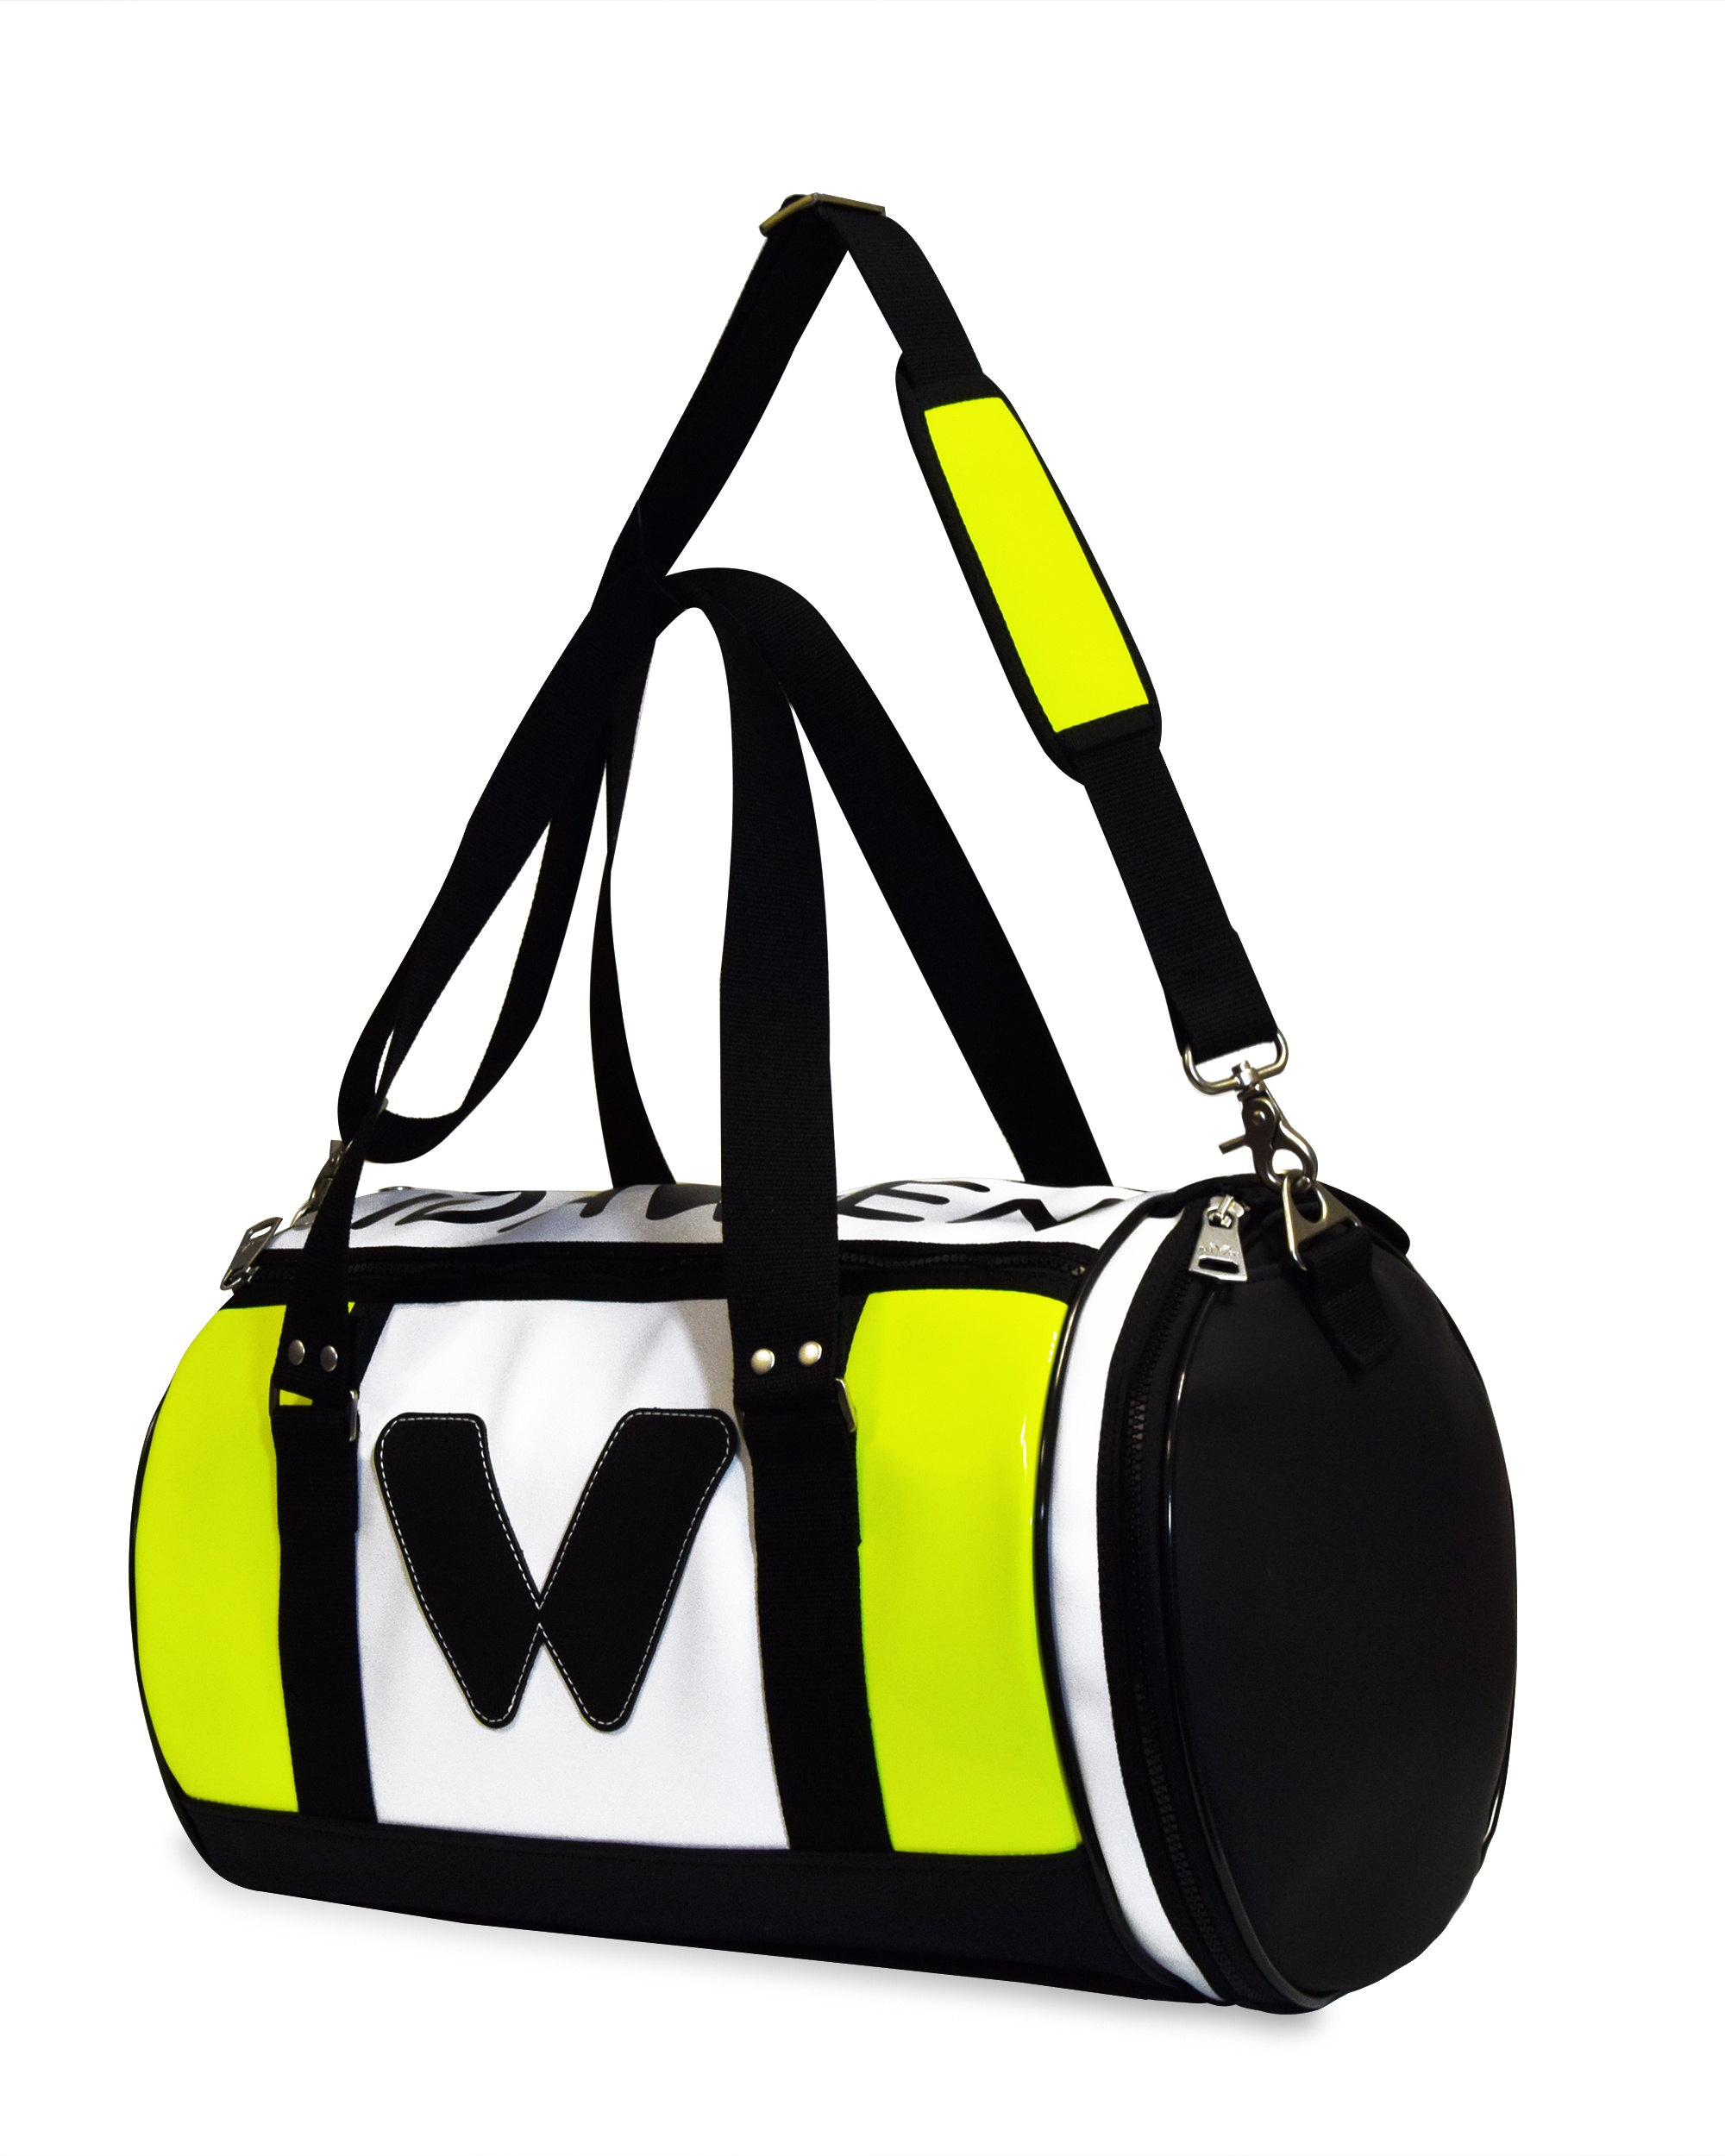 Duffle Sport Bag Neon Gym Bags Ce Idawen Woman And Fashion